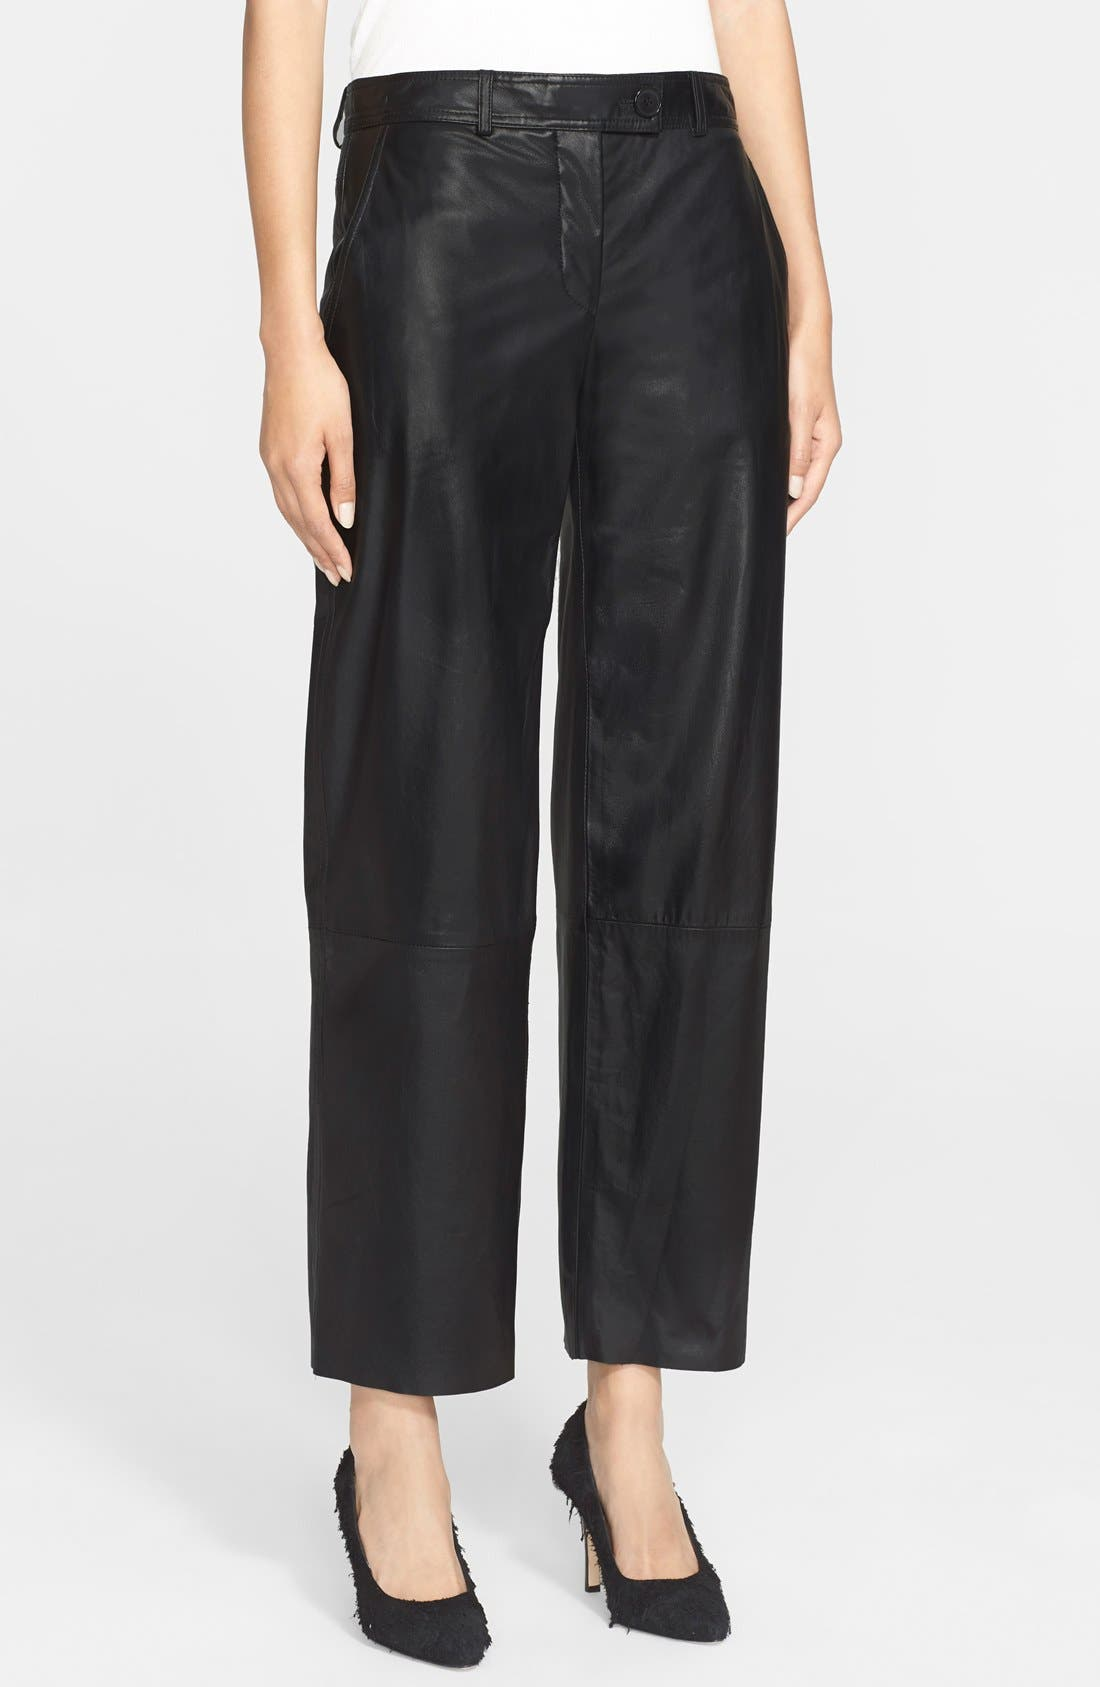 Alternate Image 1 Selected - Helmut Lang Crop Leather Pants